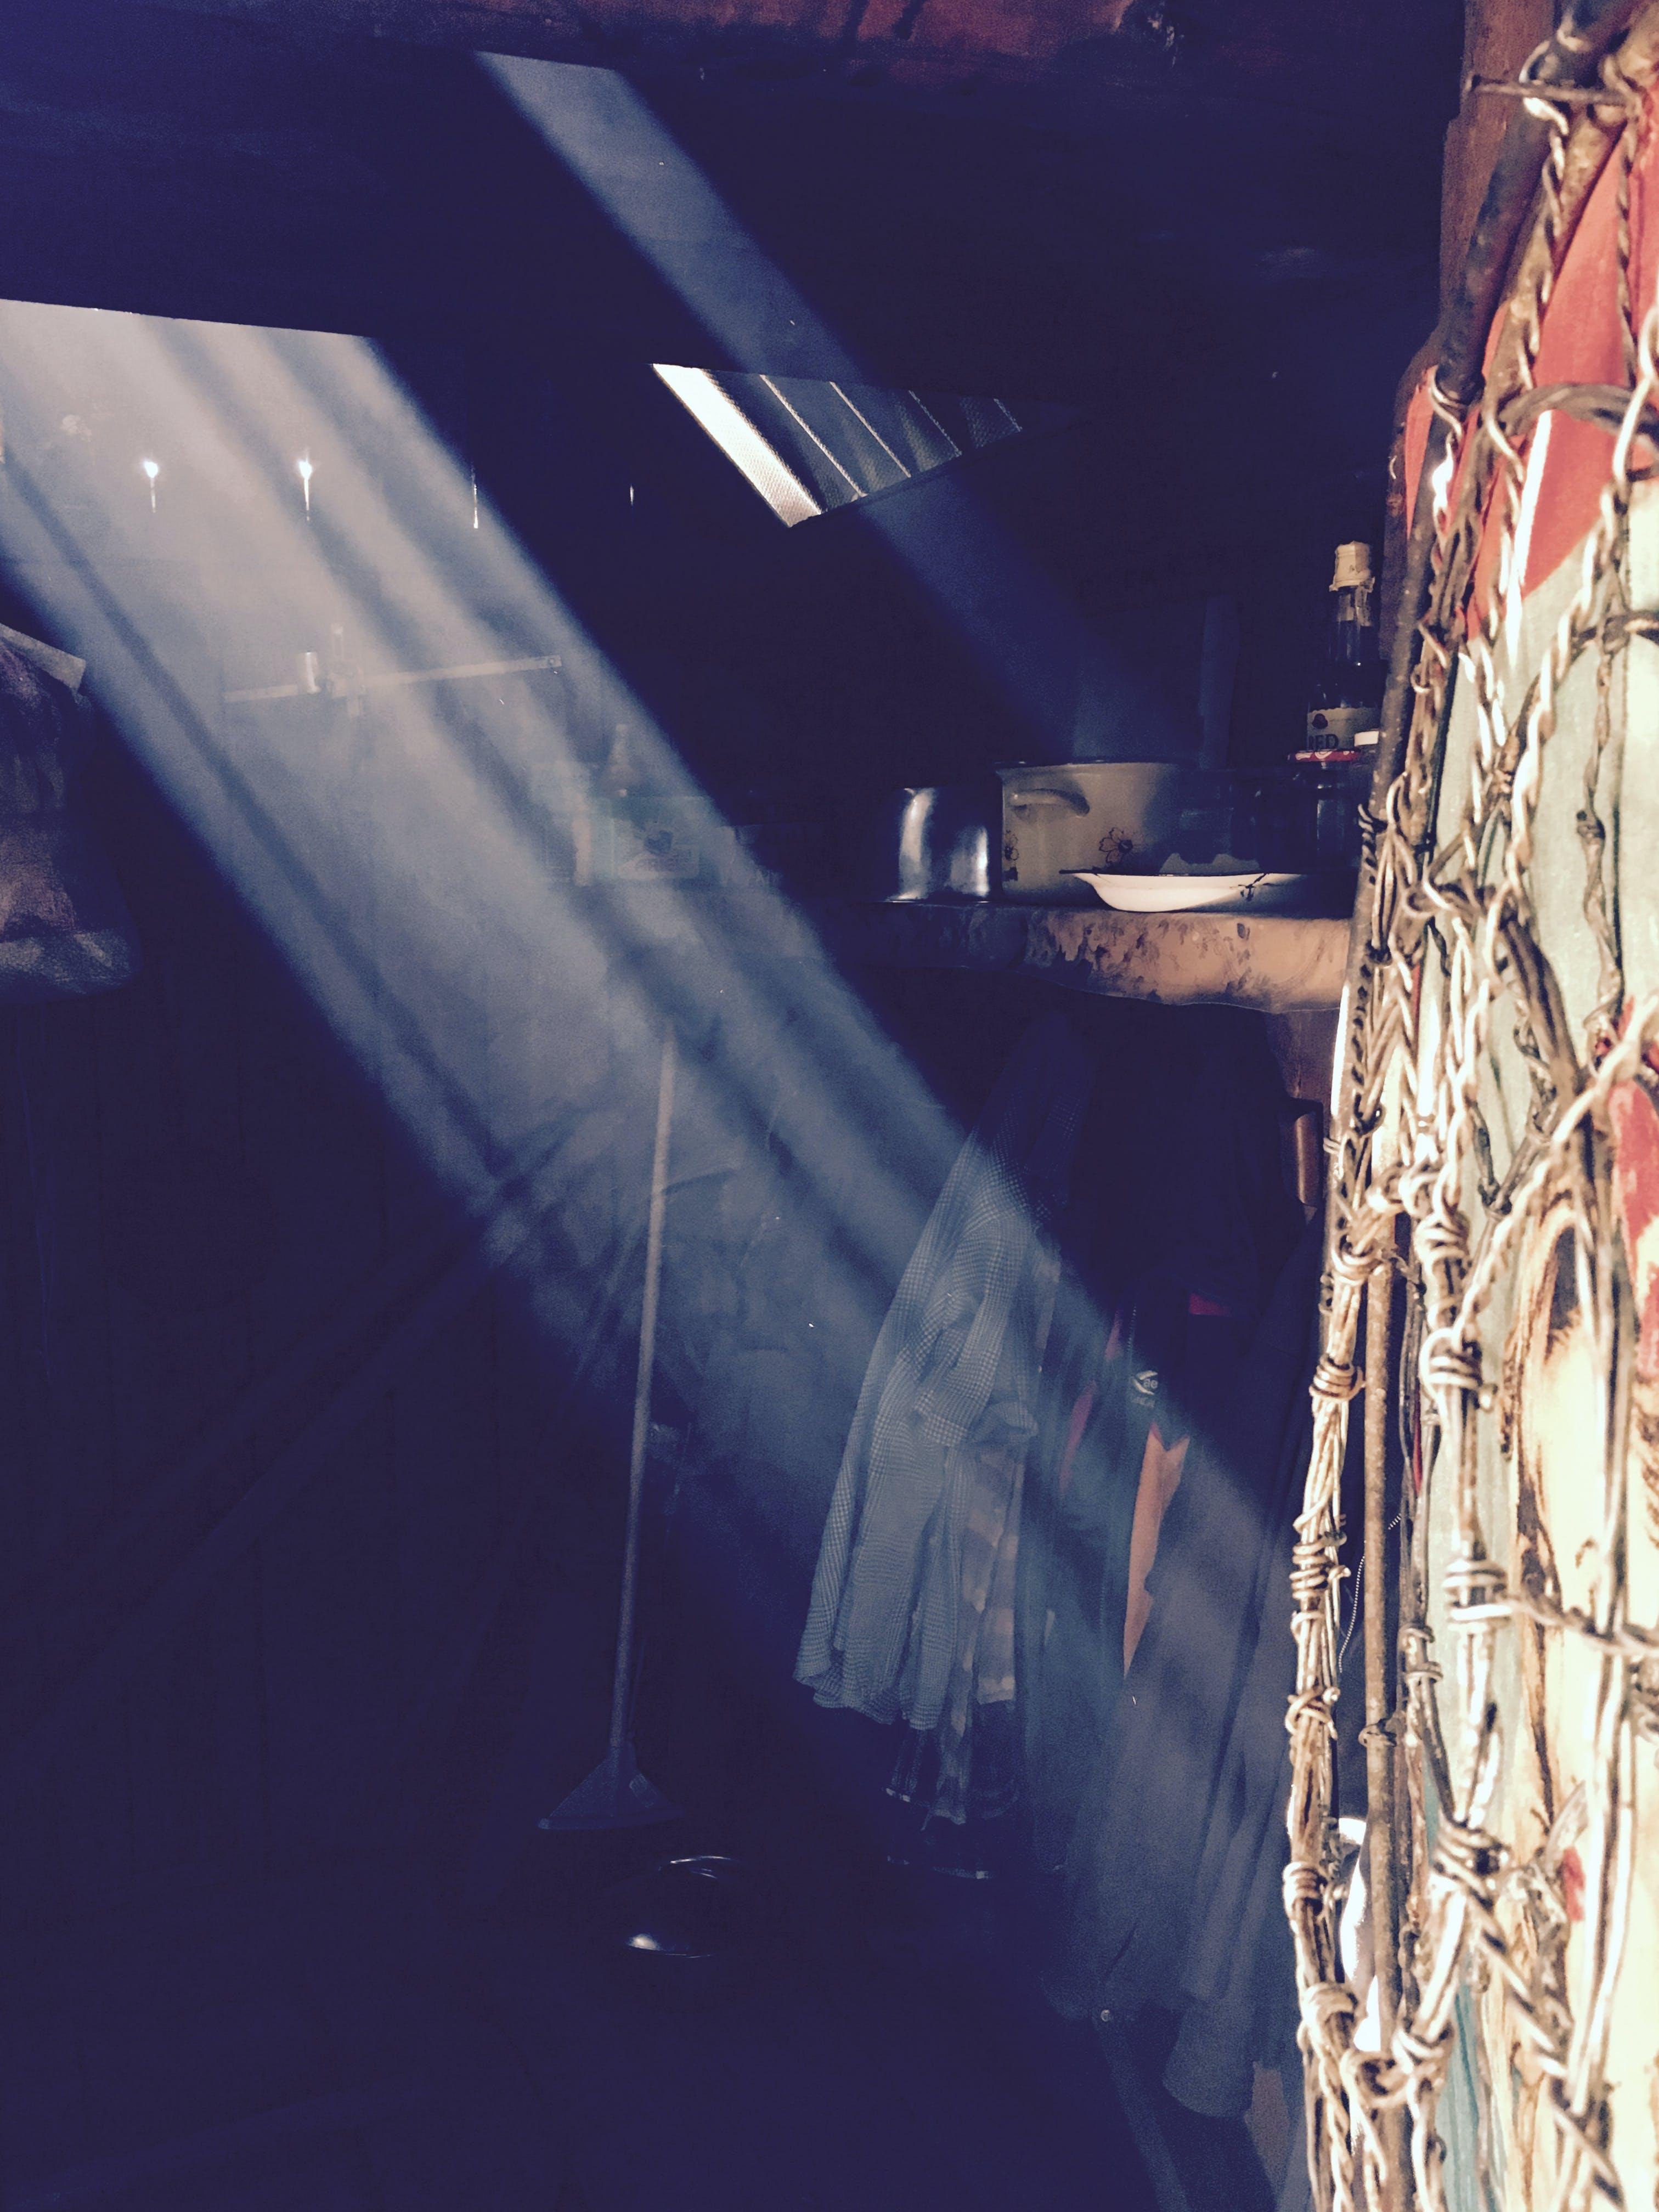 Free stock photo of light, light into sheepfold, lightning, sheepfold